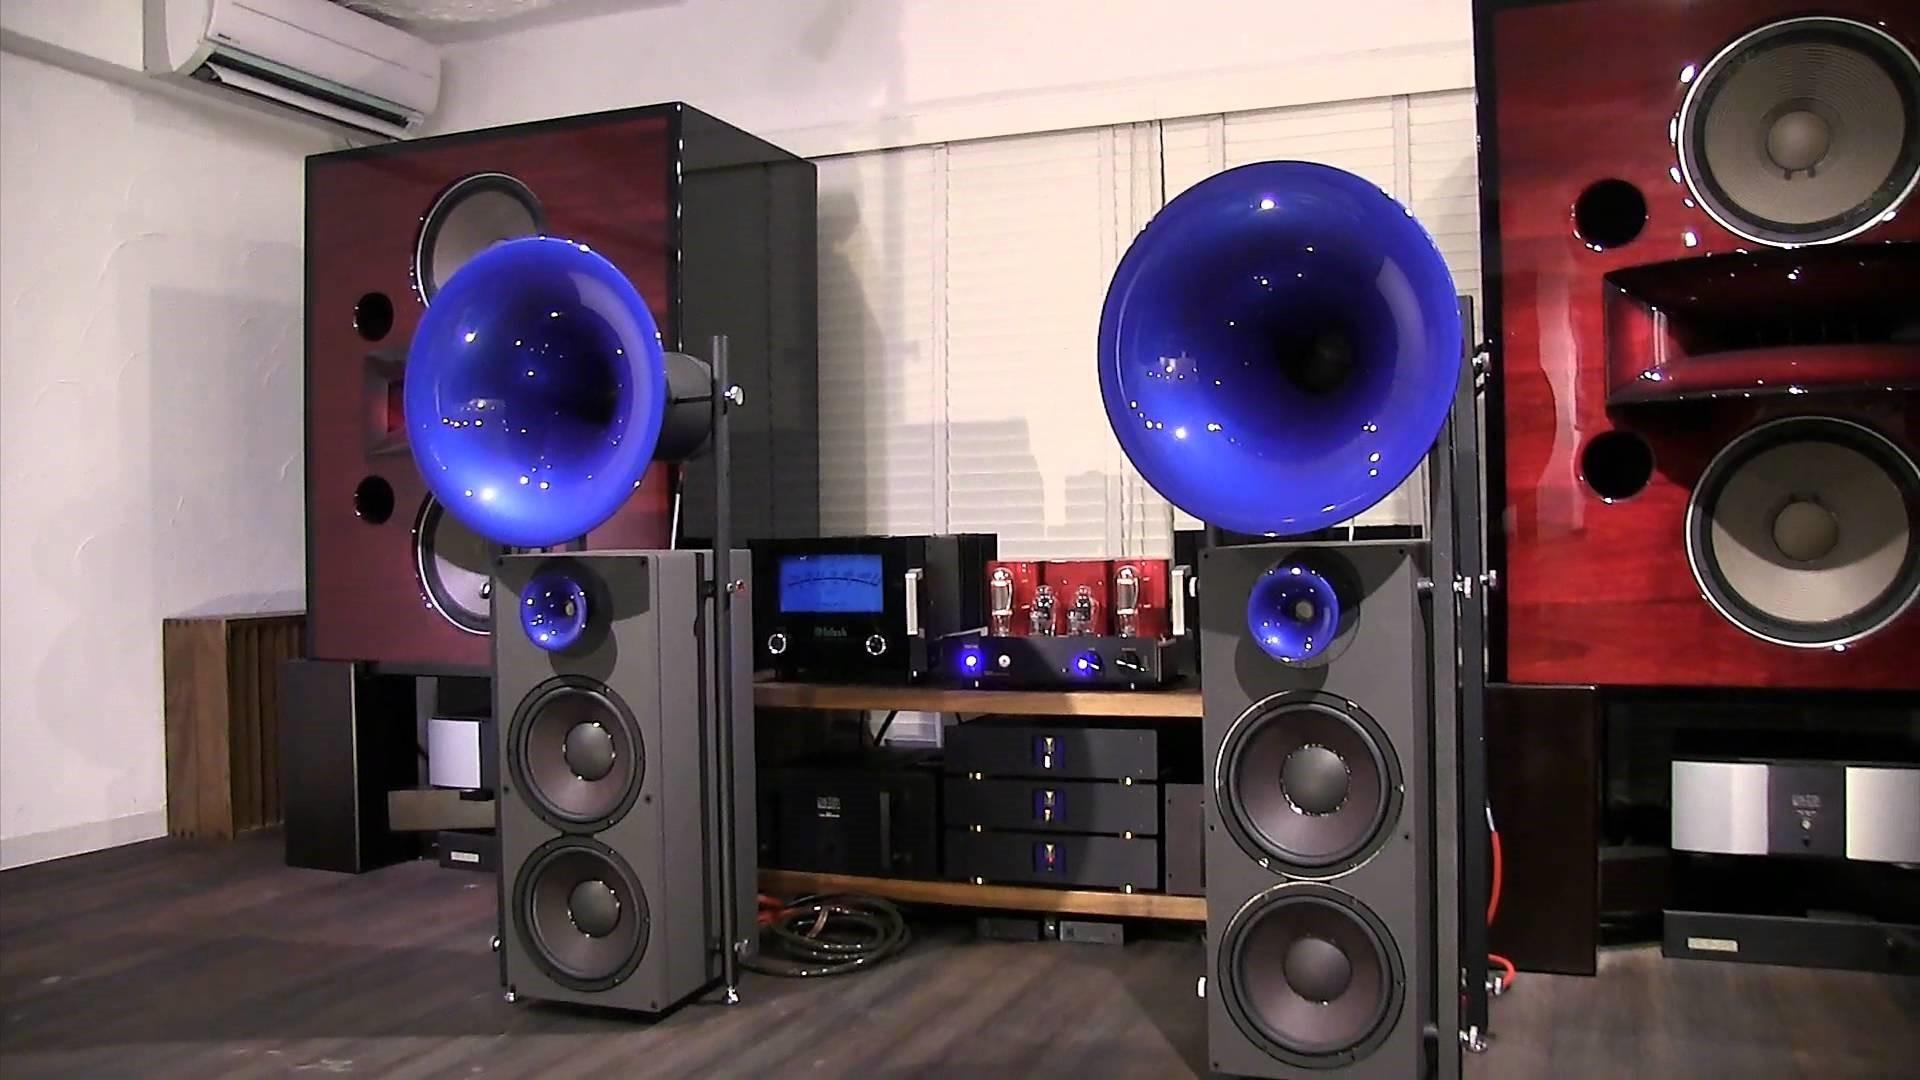 Домашняя аудиосистема своими руками